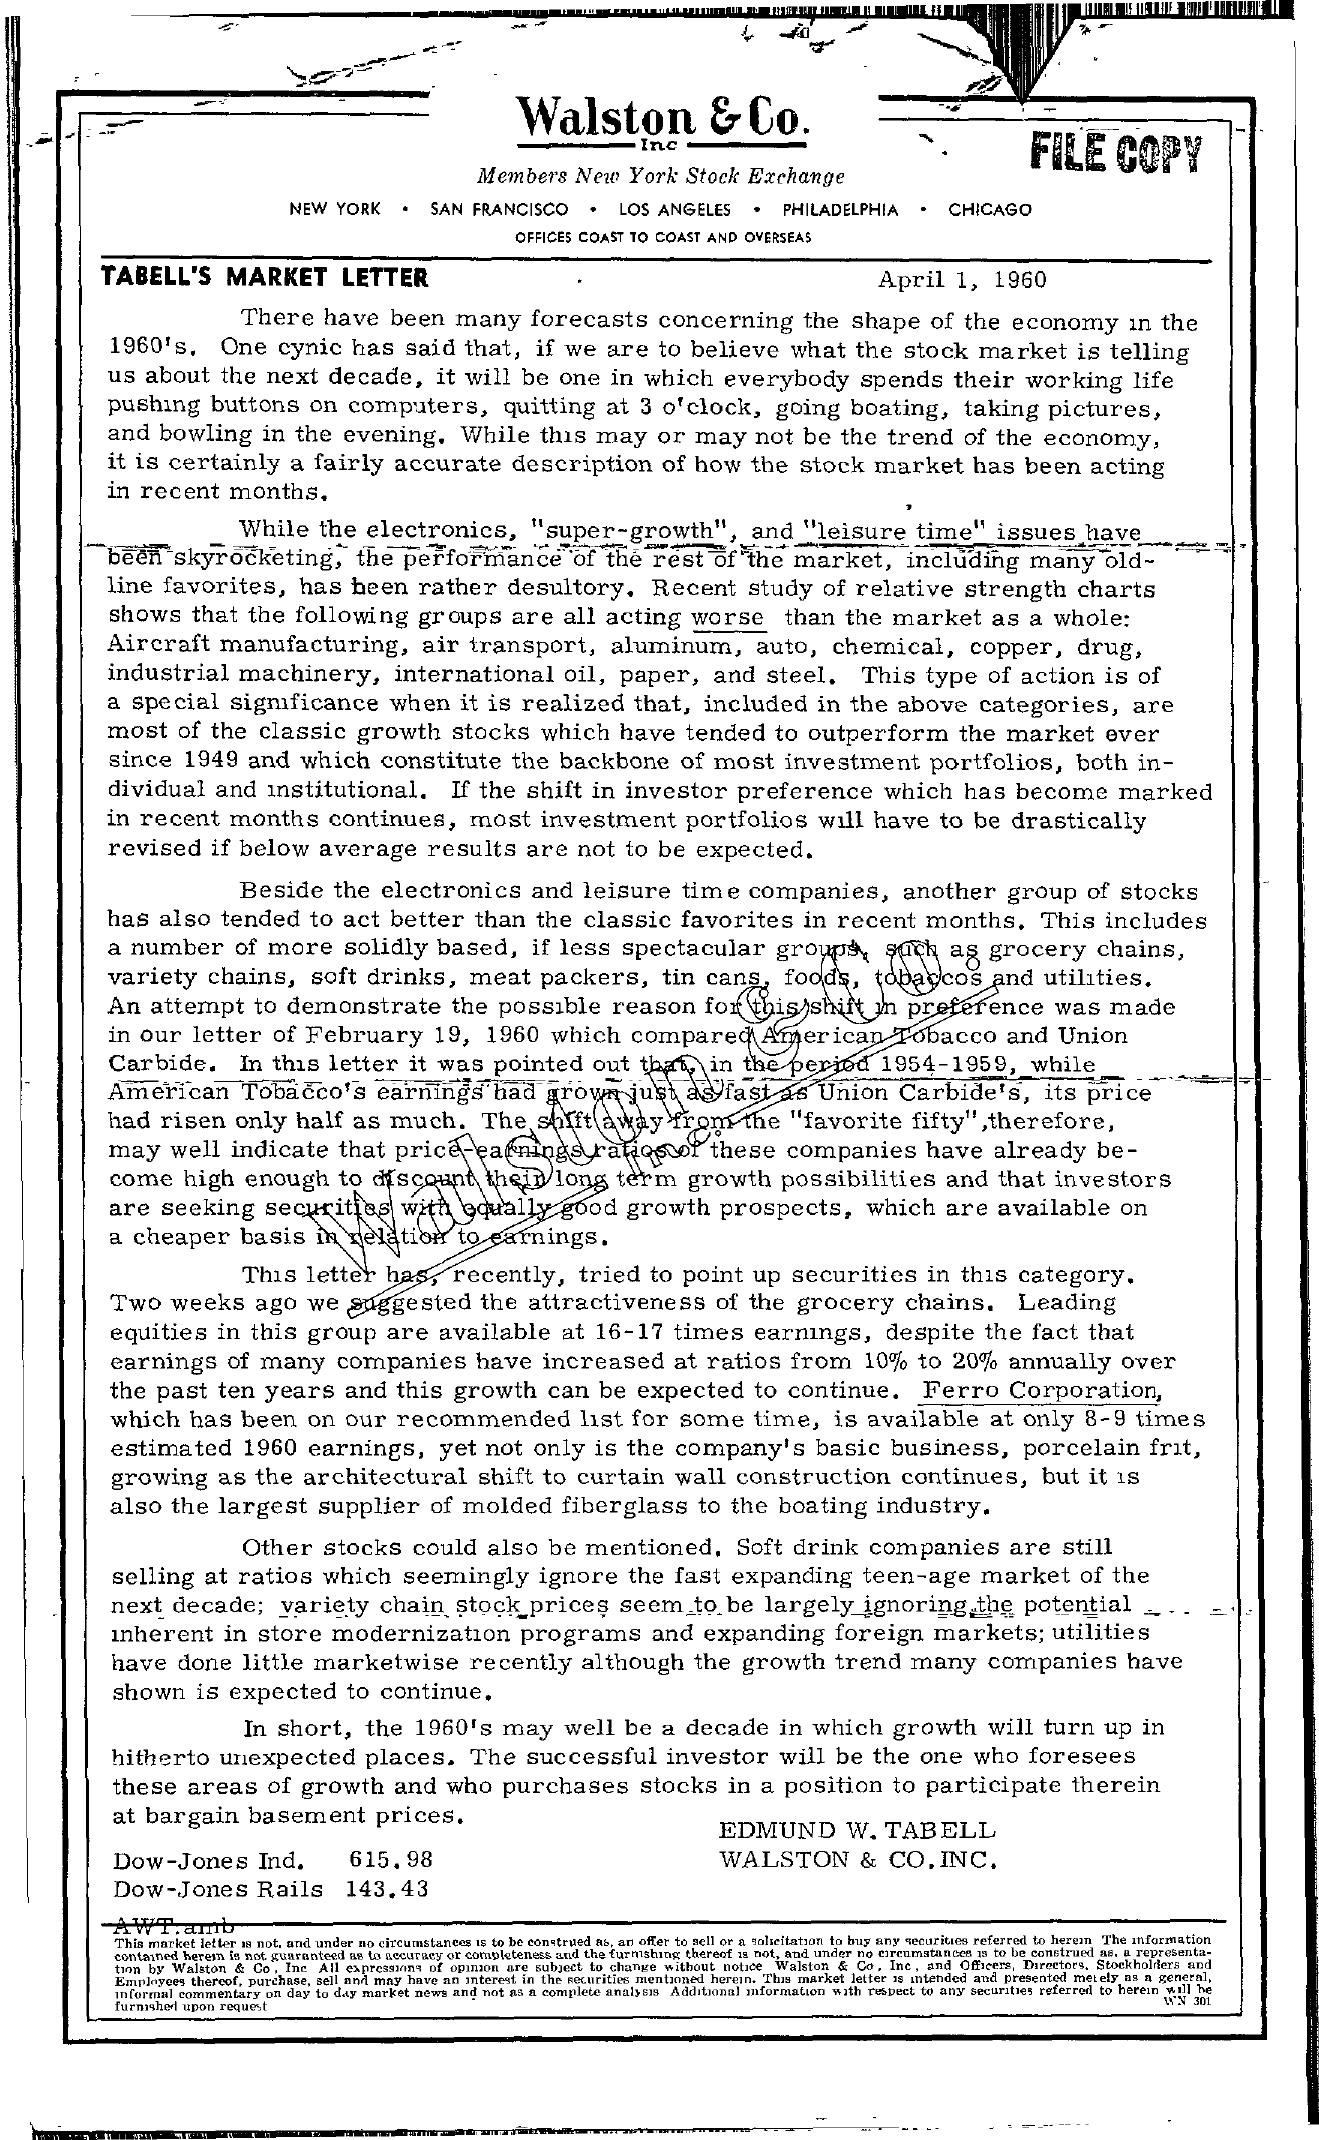 Tabell's Market Letter - April 01, 1960